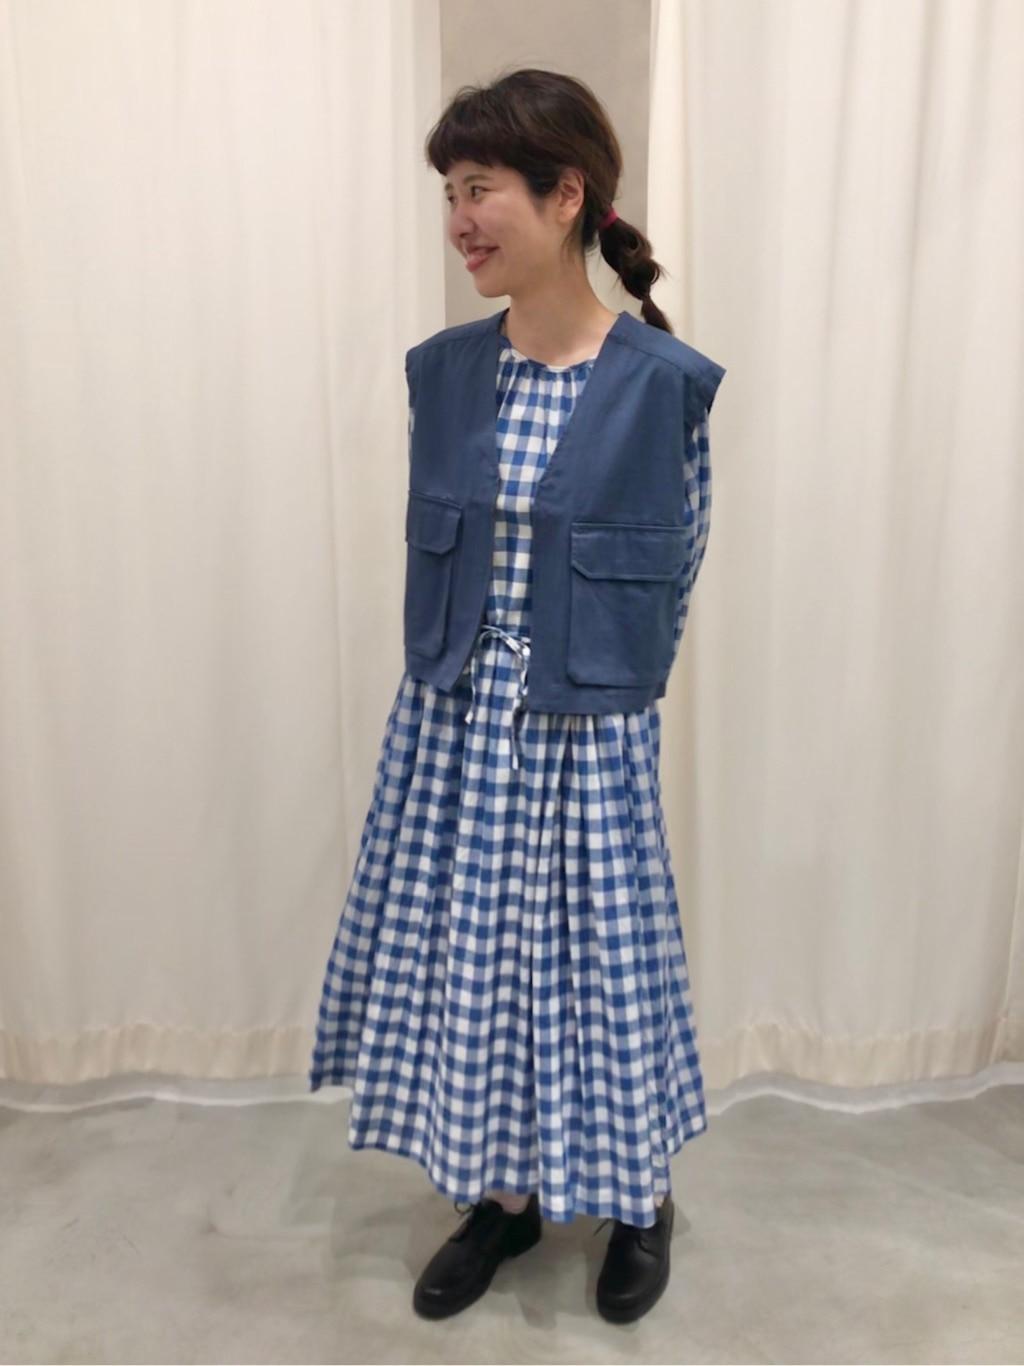 - CHILD WOMAN CHILD WOMAN , PAR ICI 東京スカイツリータウン・ソラマチ 身長:160cm 2021.04.26